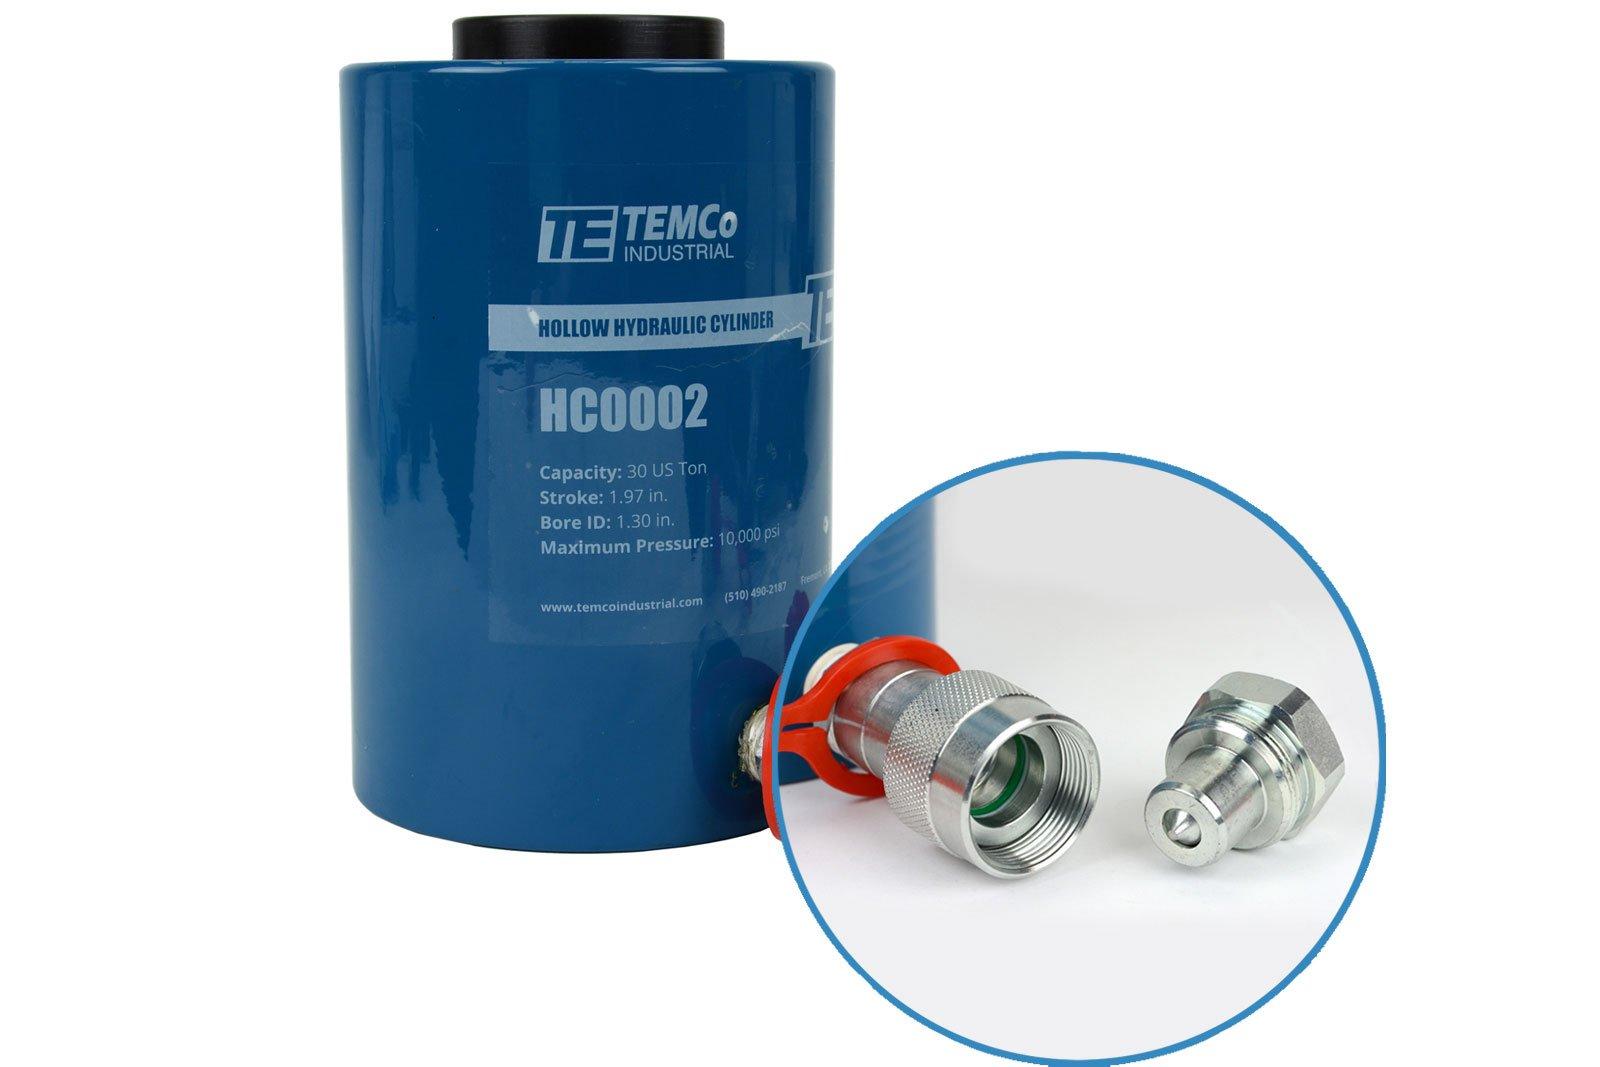 TEMCo HC0002 - Hollow Hydraulic Cylinder Ram 30 TON 2 In Stroke - 5 YEAR Warranty